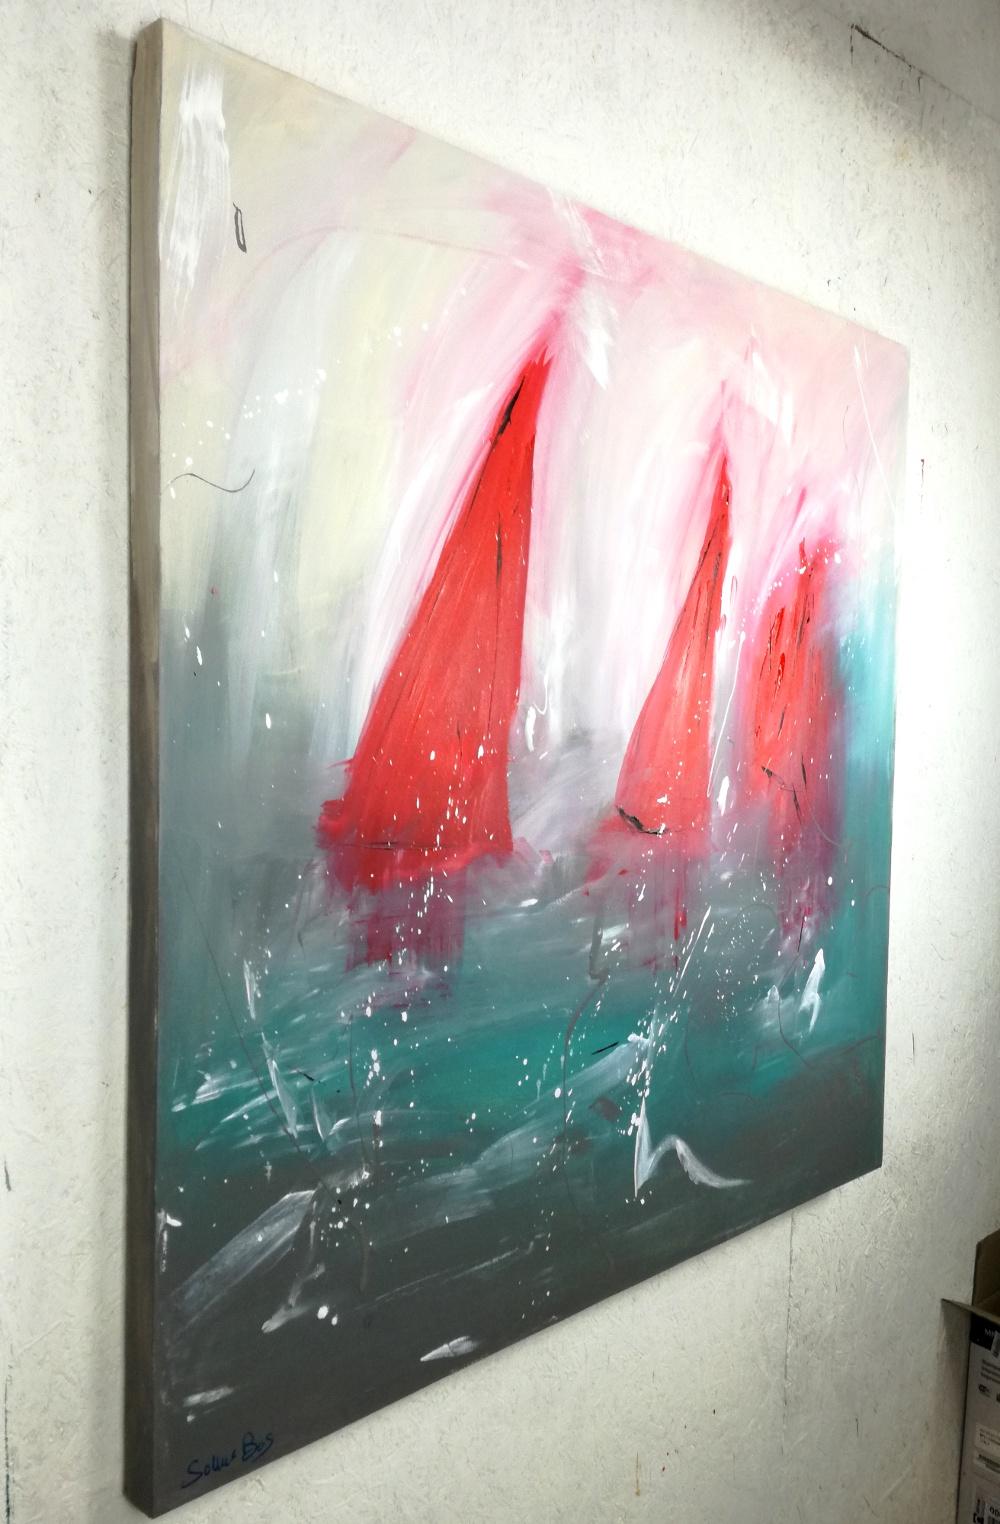 Quadri astratti dipinti olio su tela 120x120 sauro bos for Quadri moderni su tela